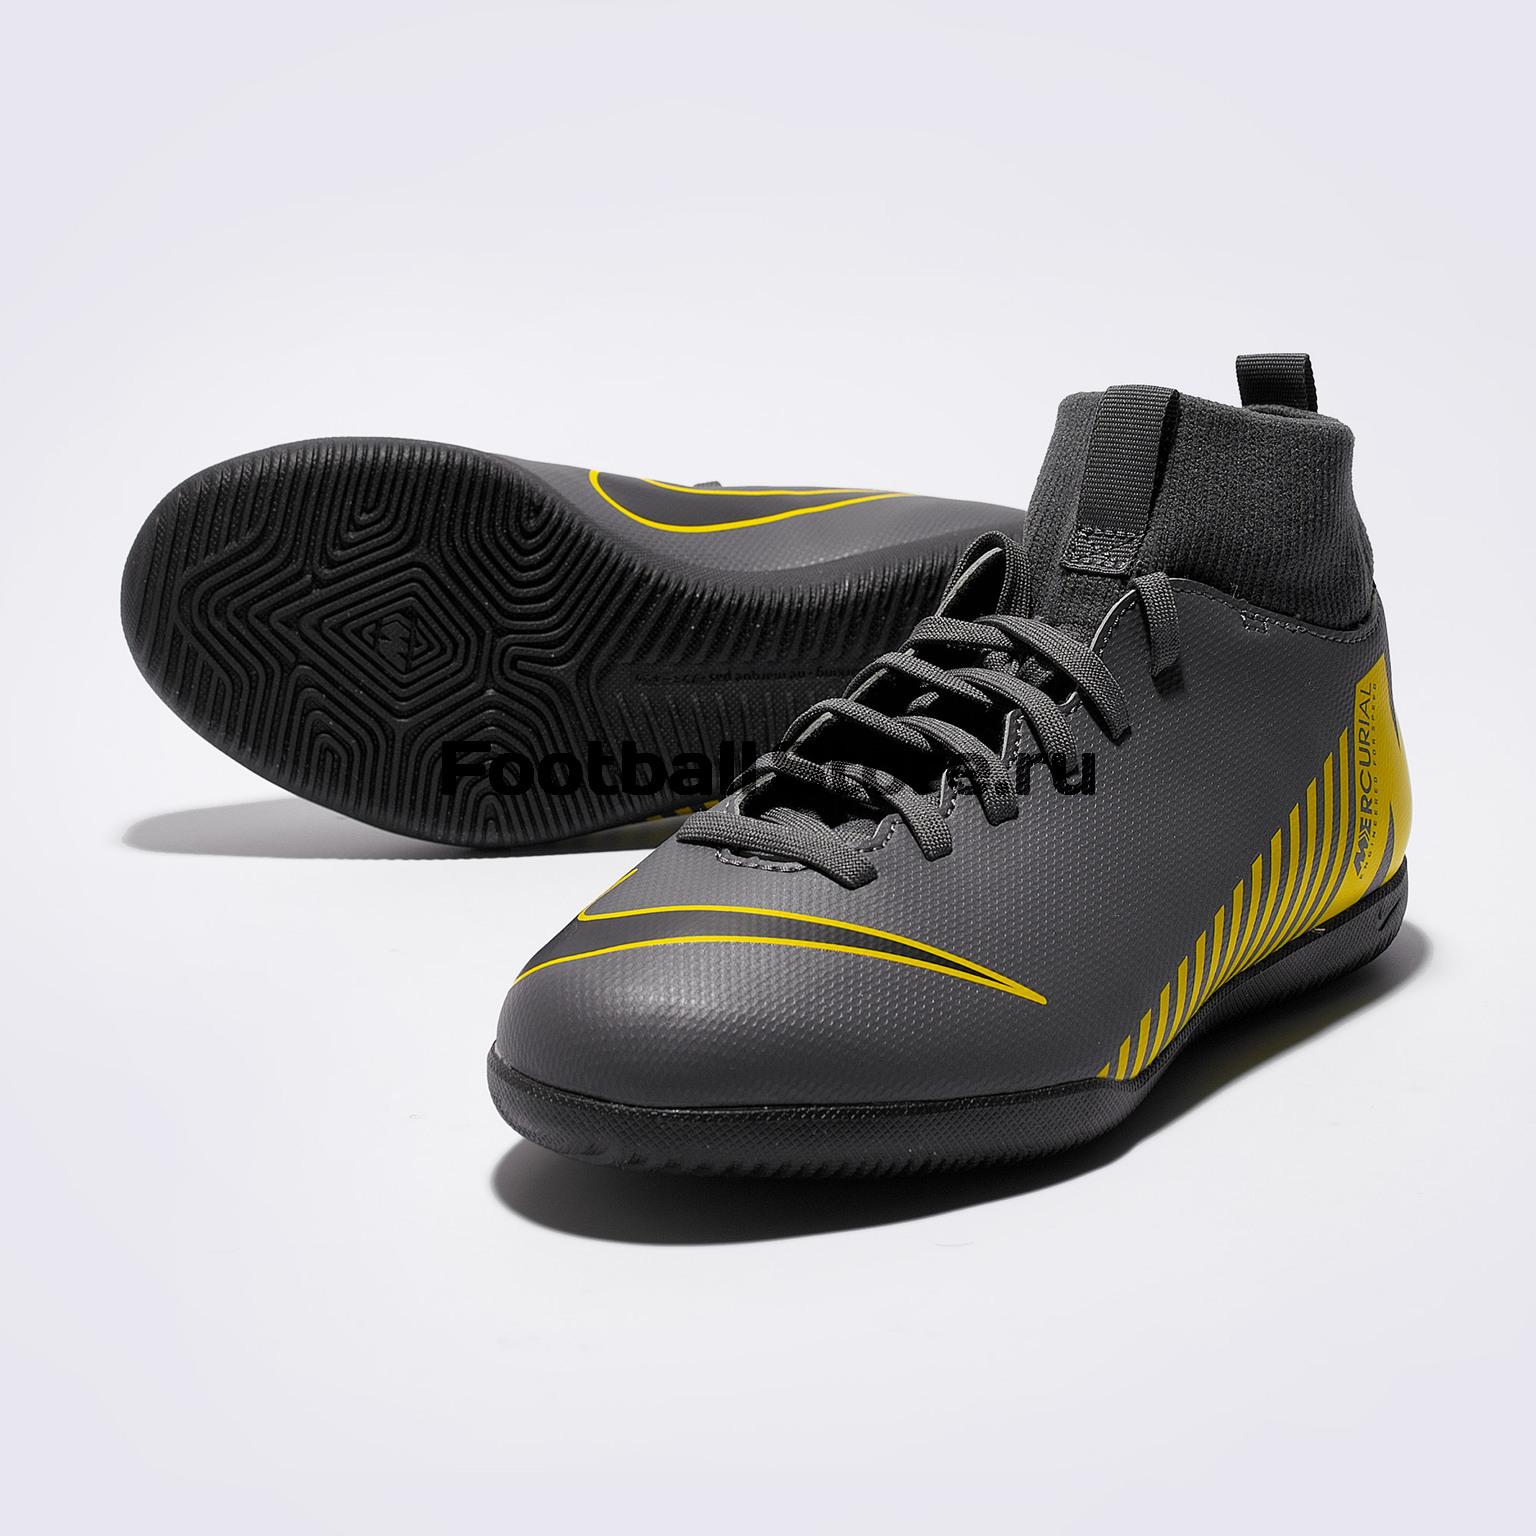 1c4eb55a Футзалки детские Nike Superfly 6 Club IC AH7346-070